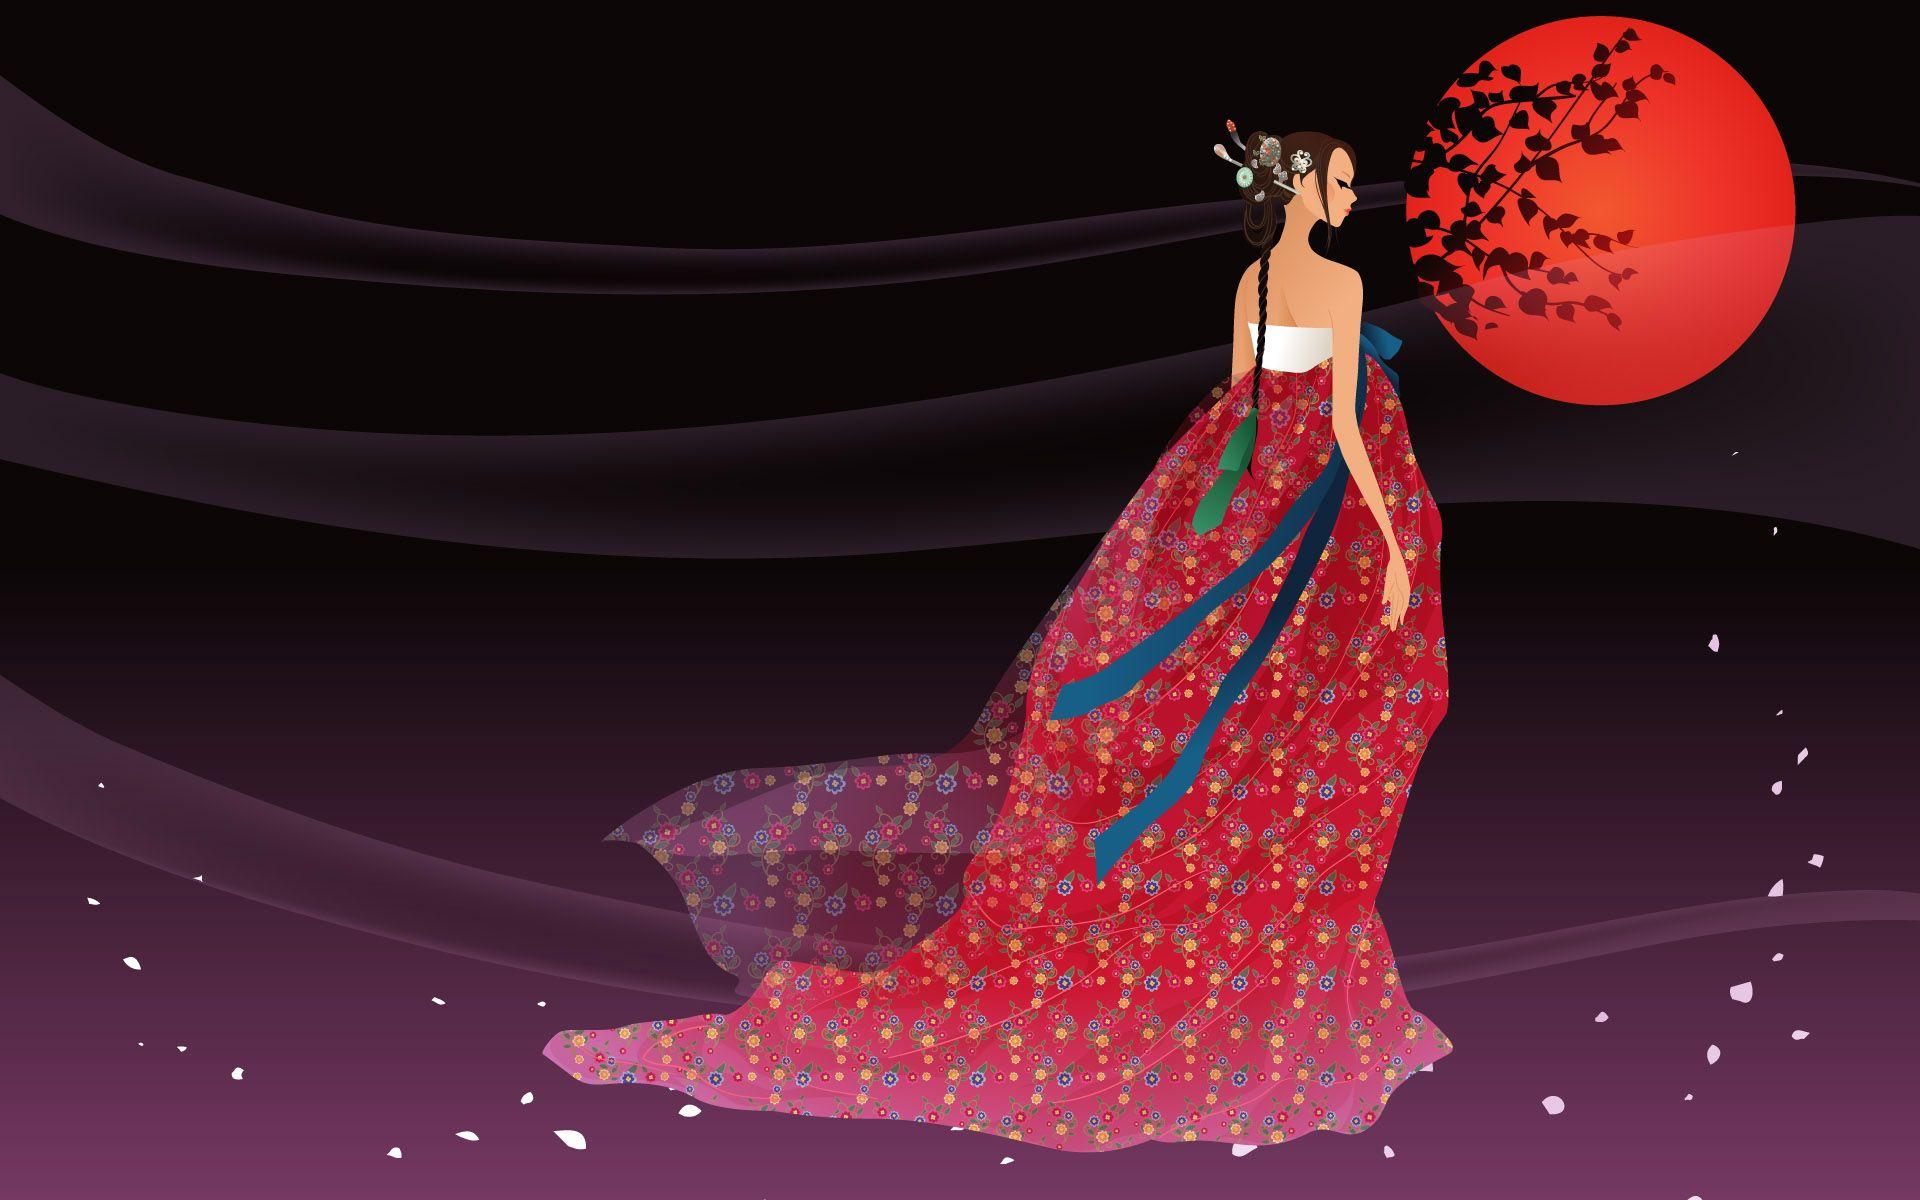 Korean Women Wallpapers 7010 Korean Women Cartoon Cartoon Illustration Magical Art Art Artistic Wallpaper